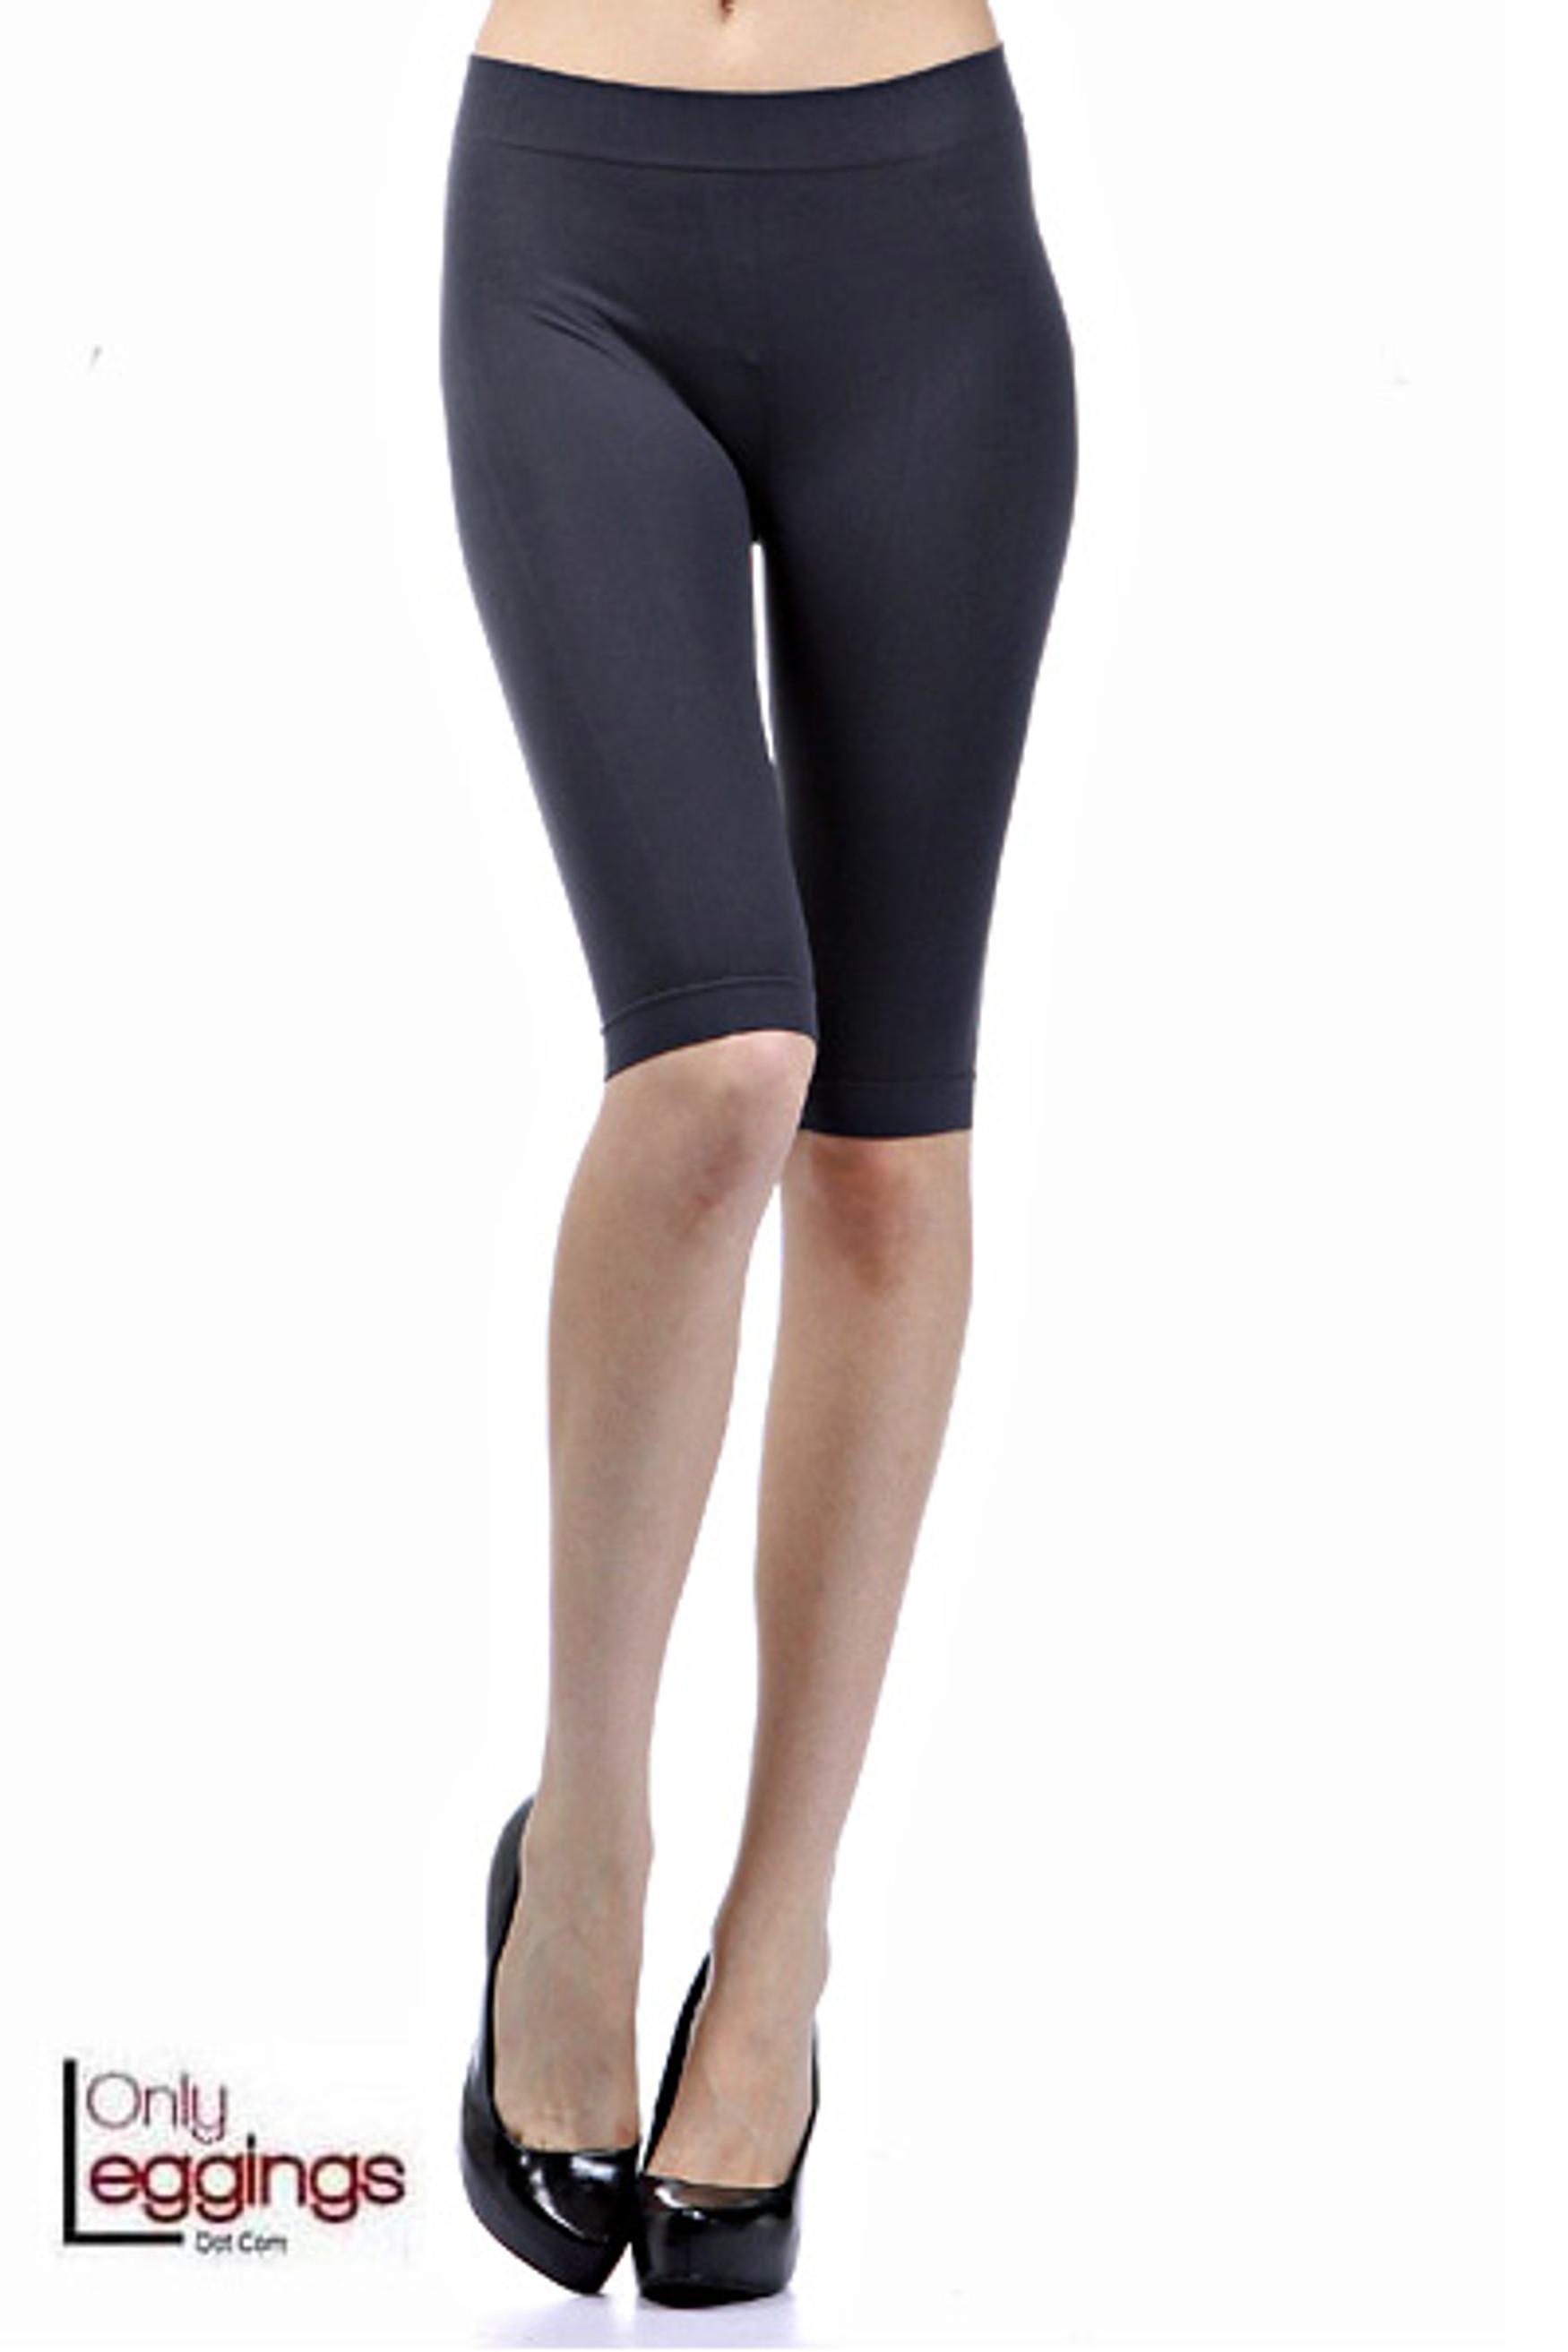 7 Inch Multi Size Nylon Leggings